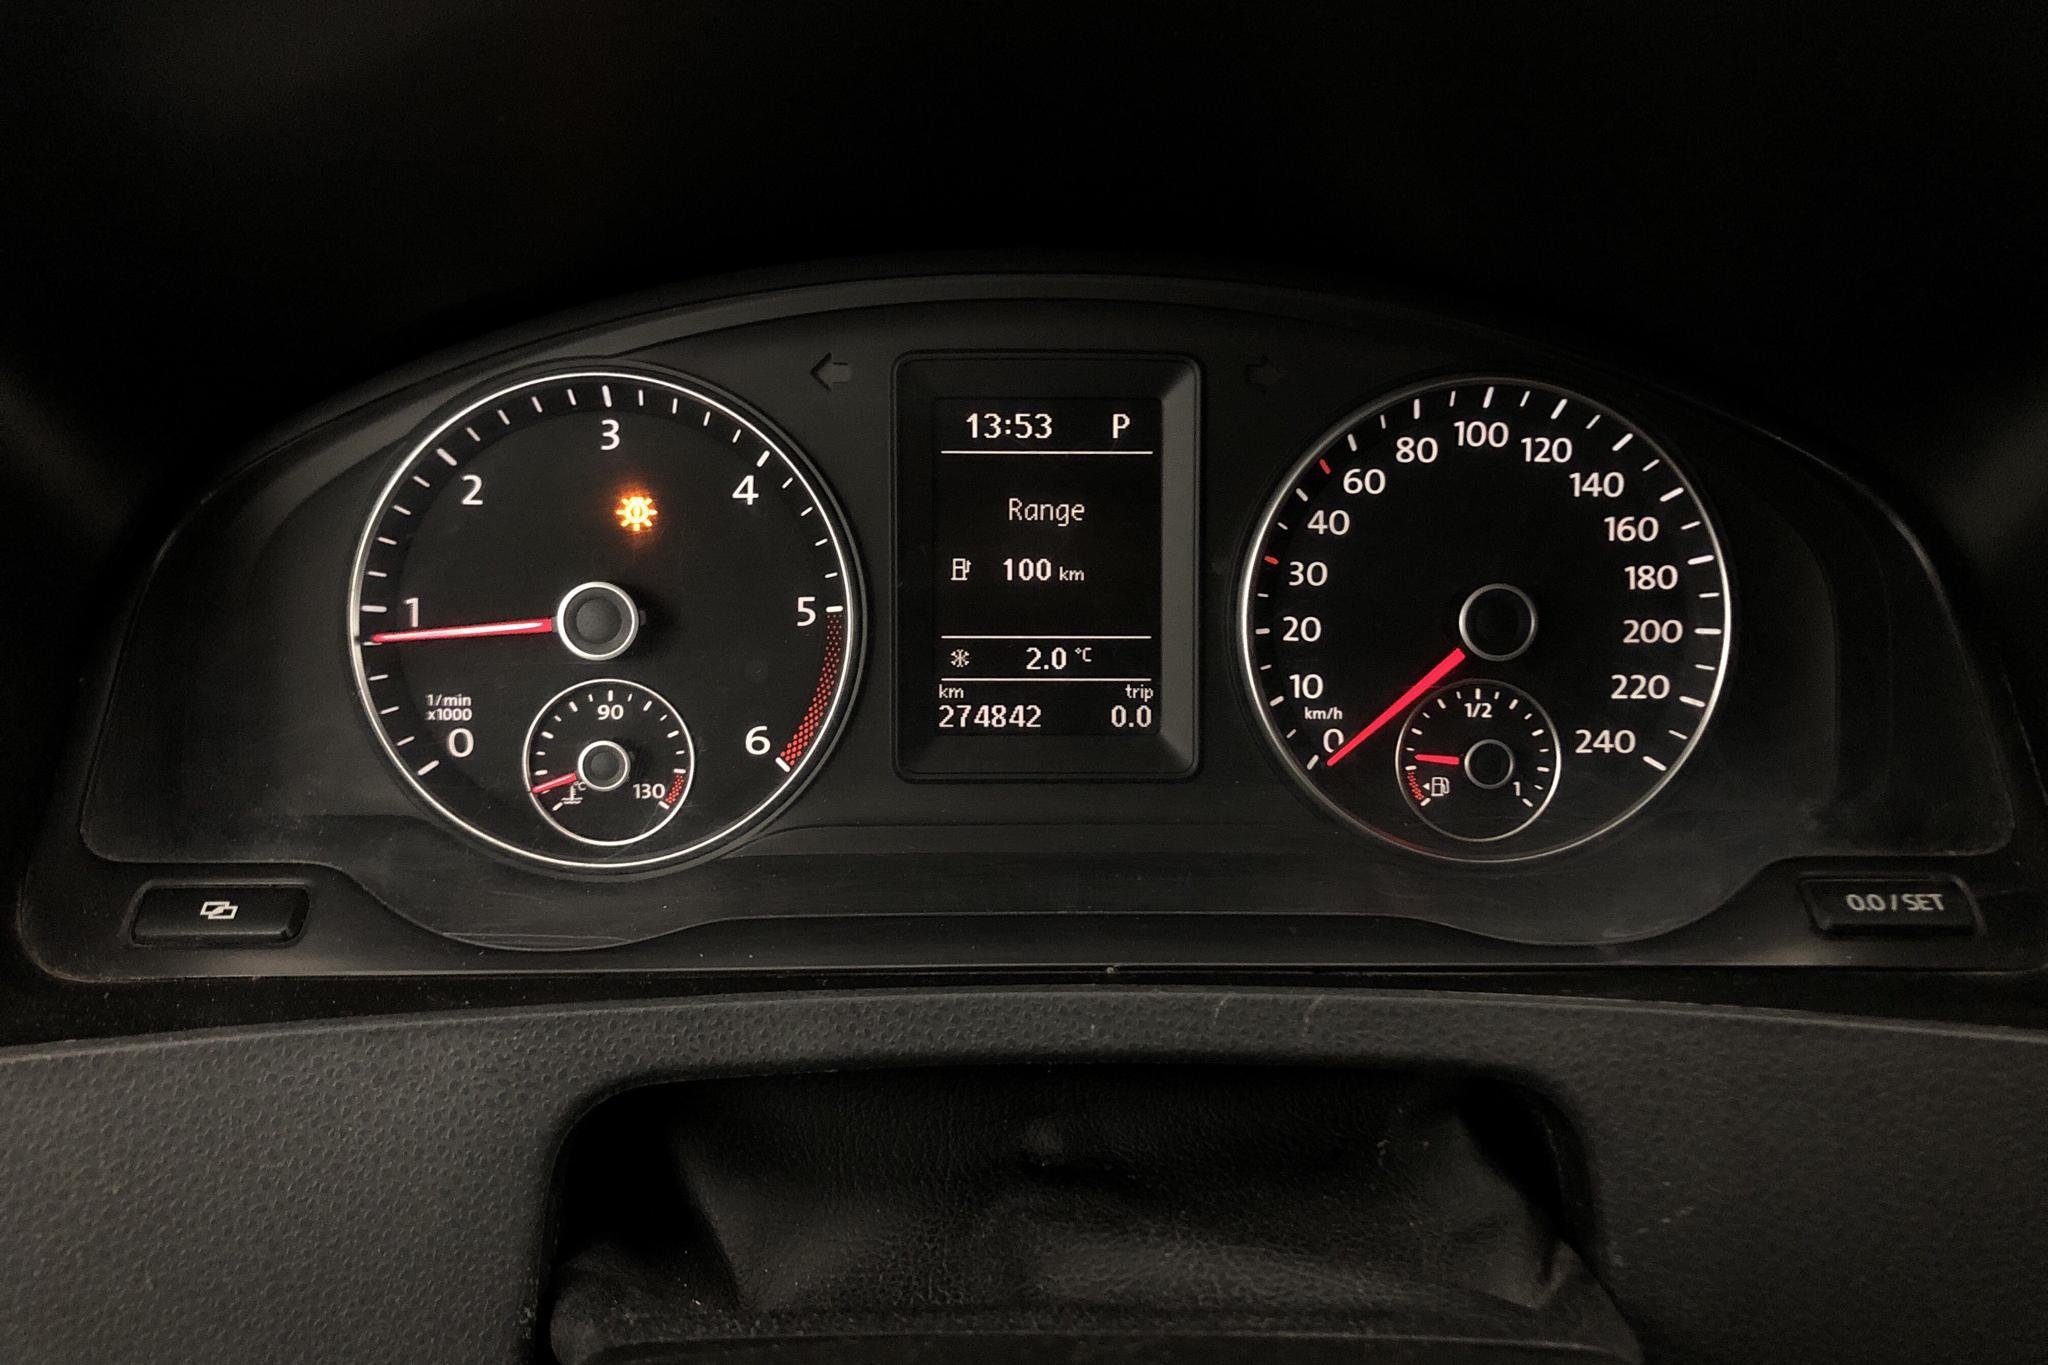 VW Transporter Kombi T5 2.0 TDI 4MOTION (180hk) - 274 840 km - Automatic - Light Green - 2010